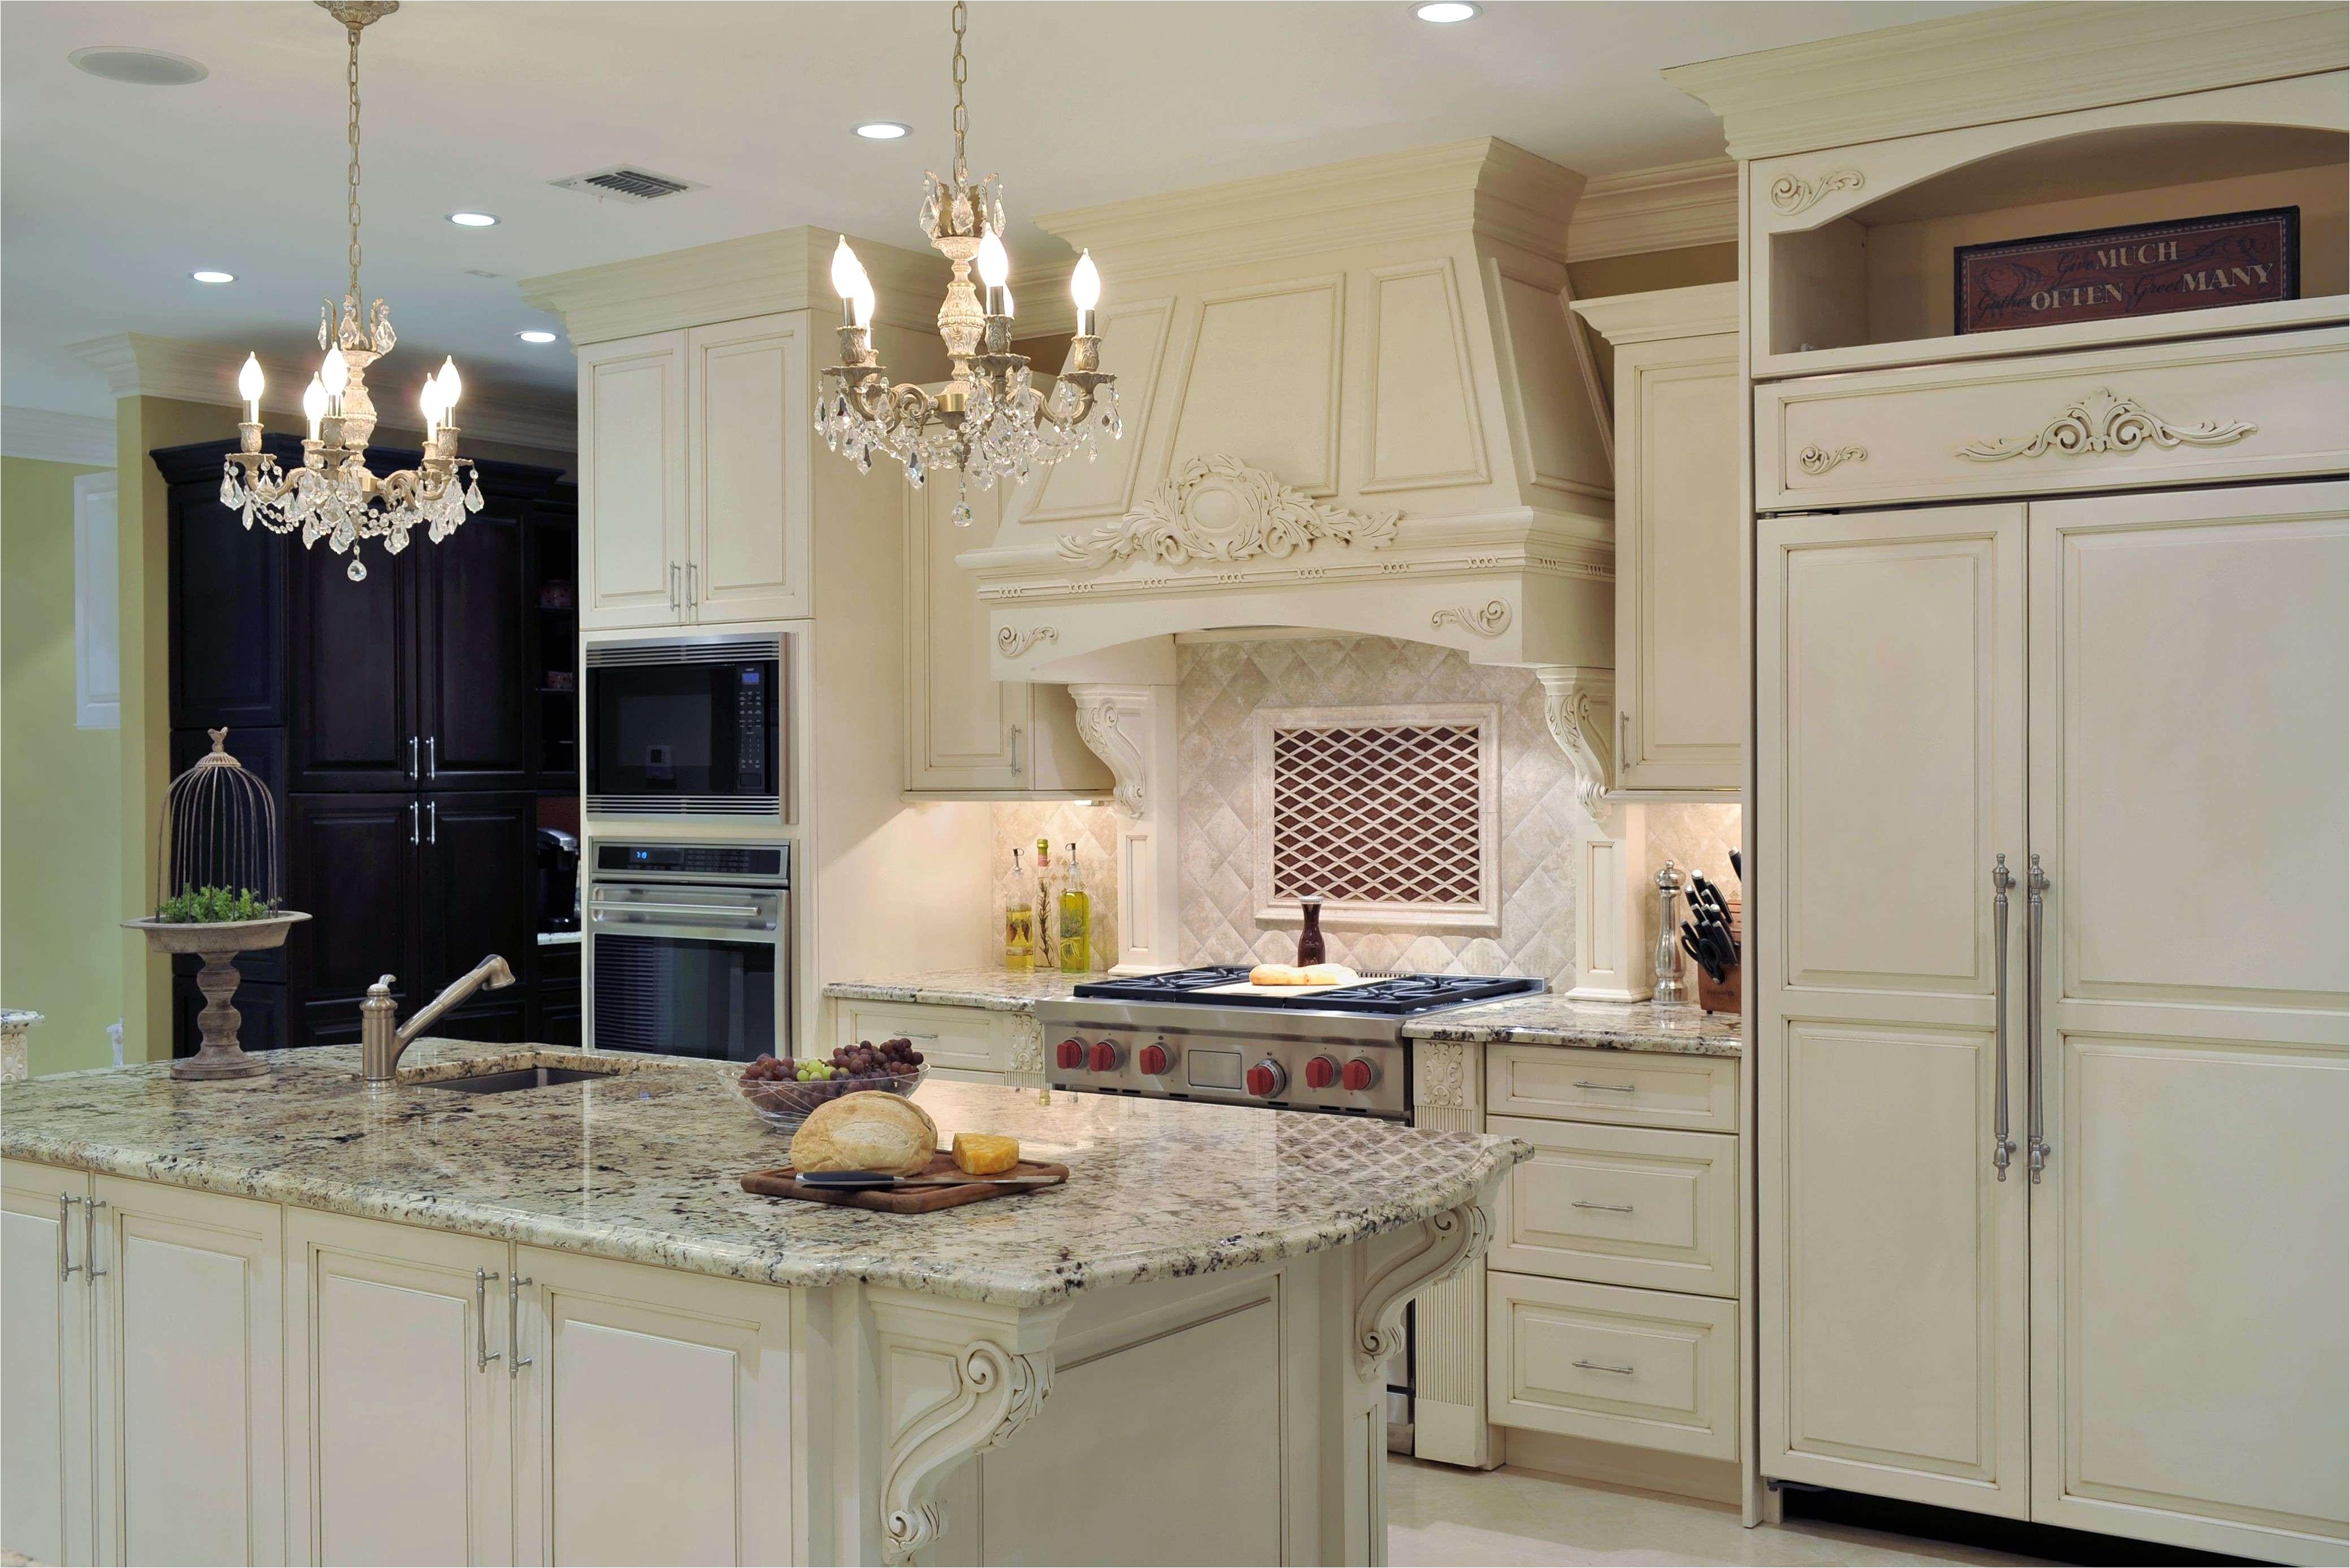 Kitchen Cabinet Design Awesome Exclusive Kitchen Designs Alluring Kitchen Cabinet 0d Bright Lights 21 Luxury